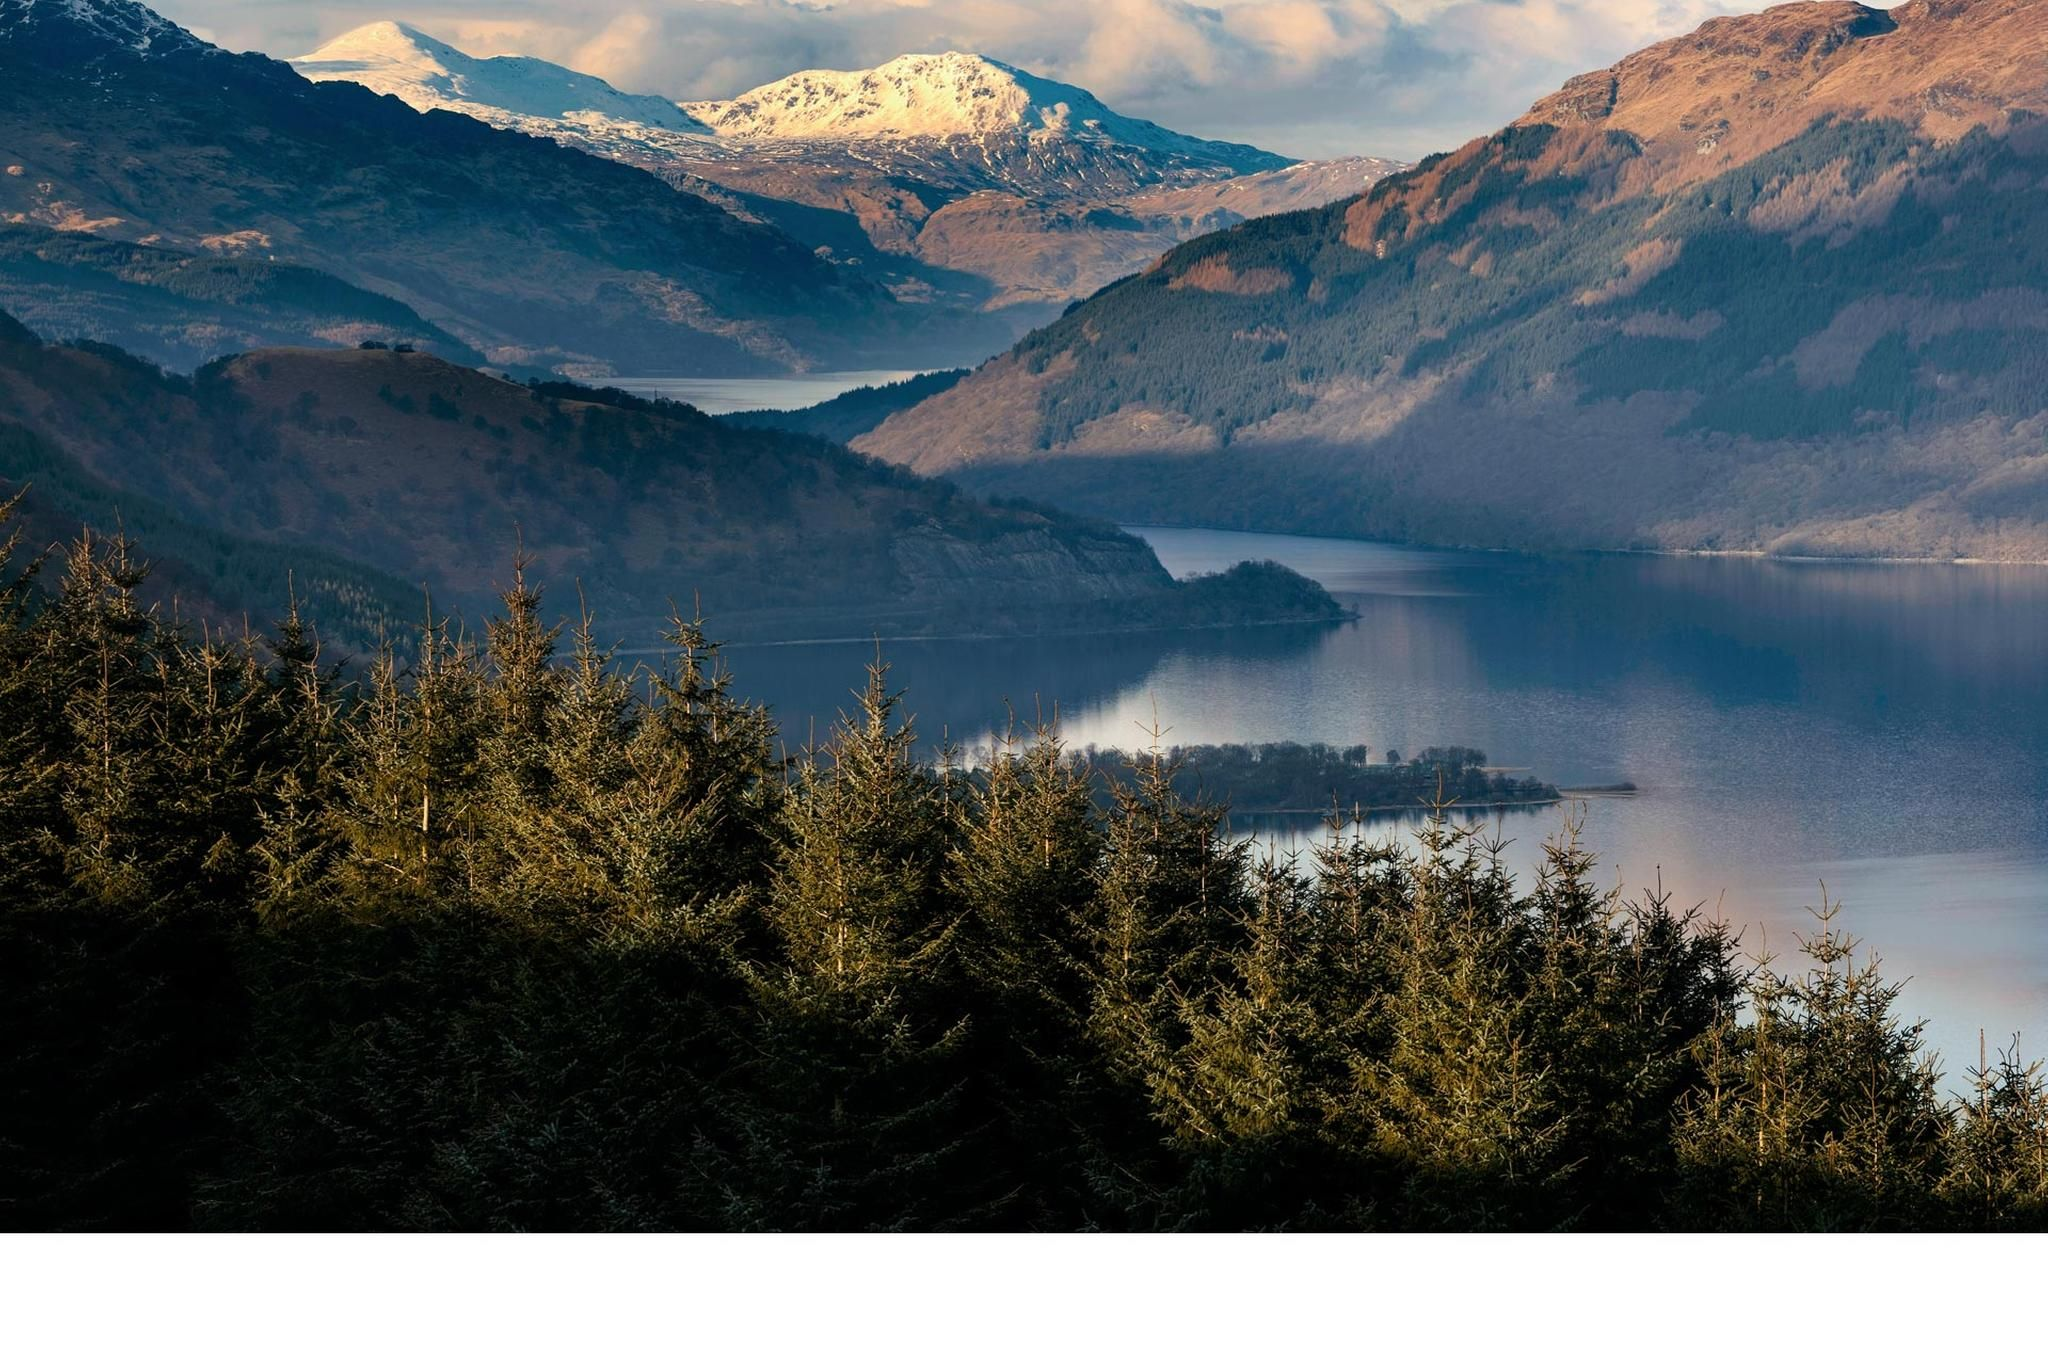 Loch Lomond, Trossachs, Stirling & Forth Valley